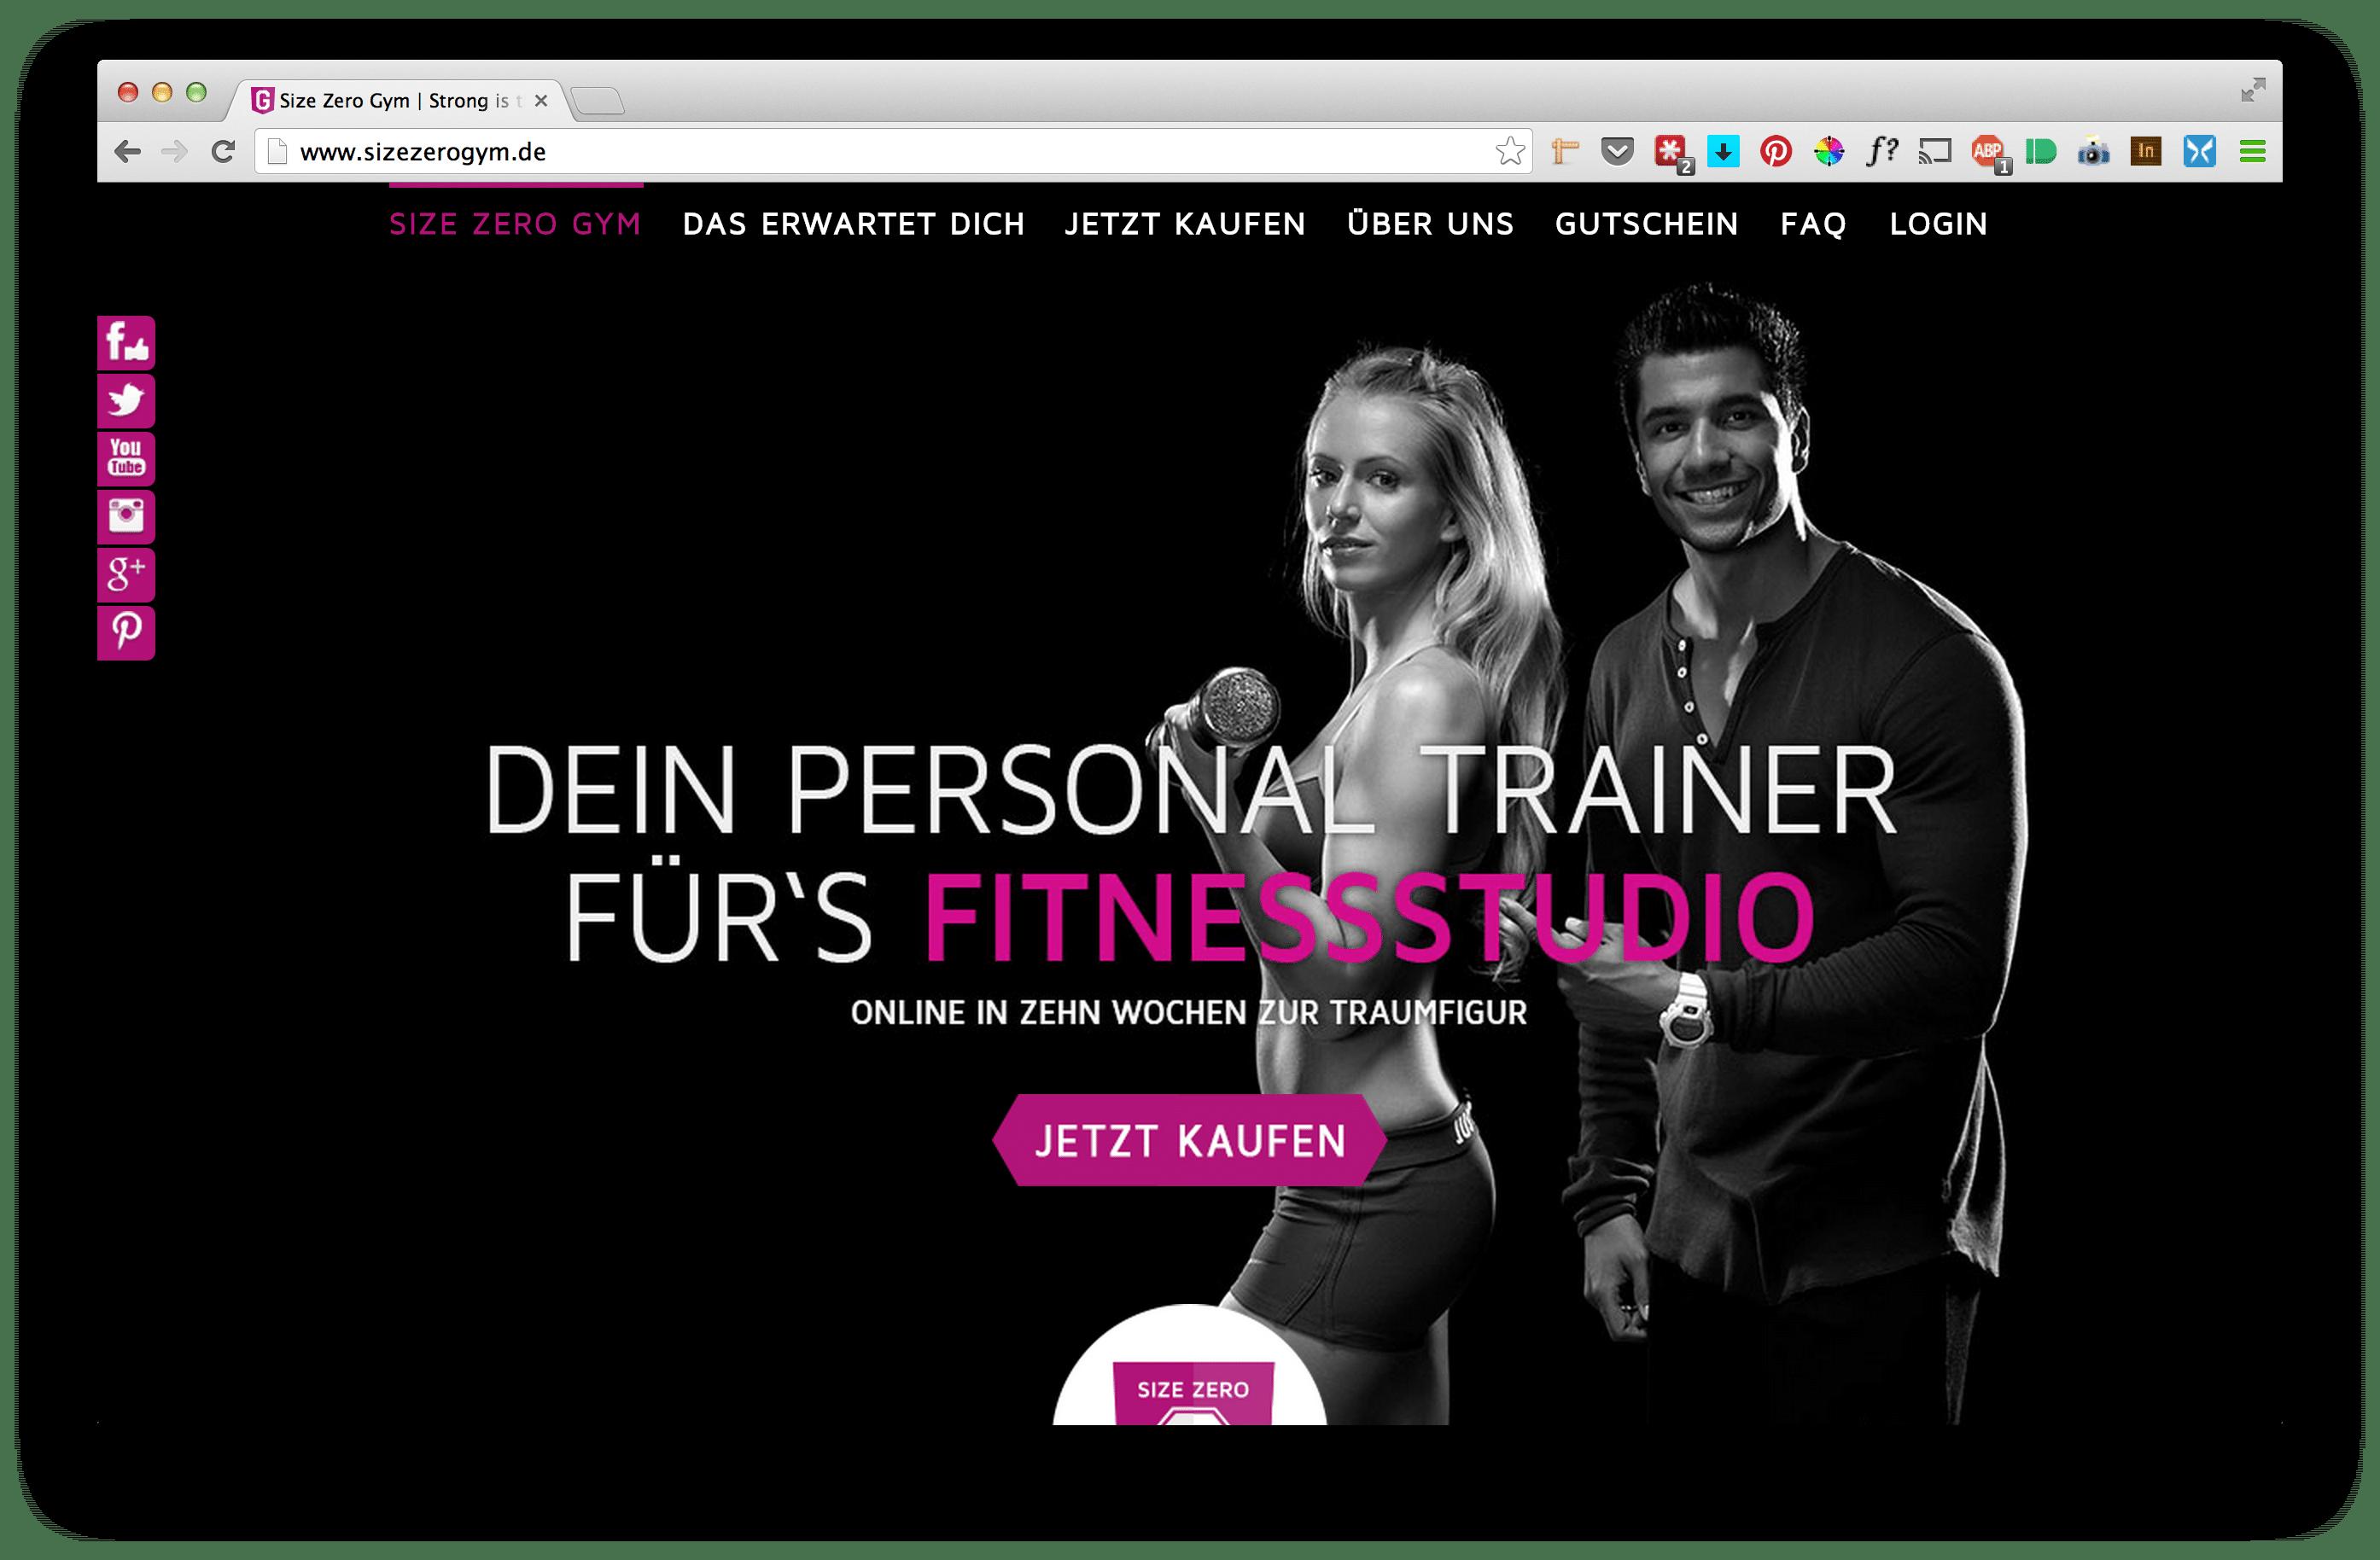 Size Zero Gym - Webdesign